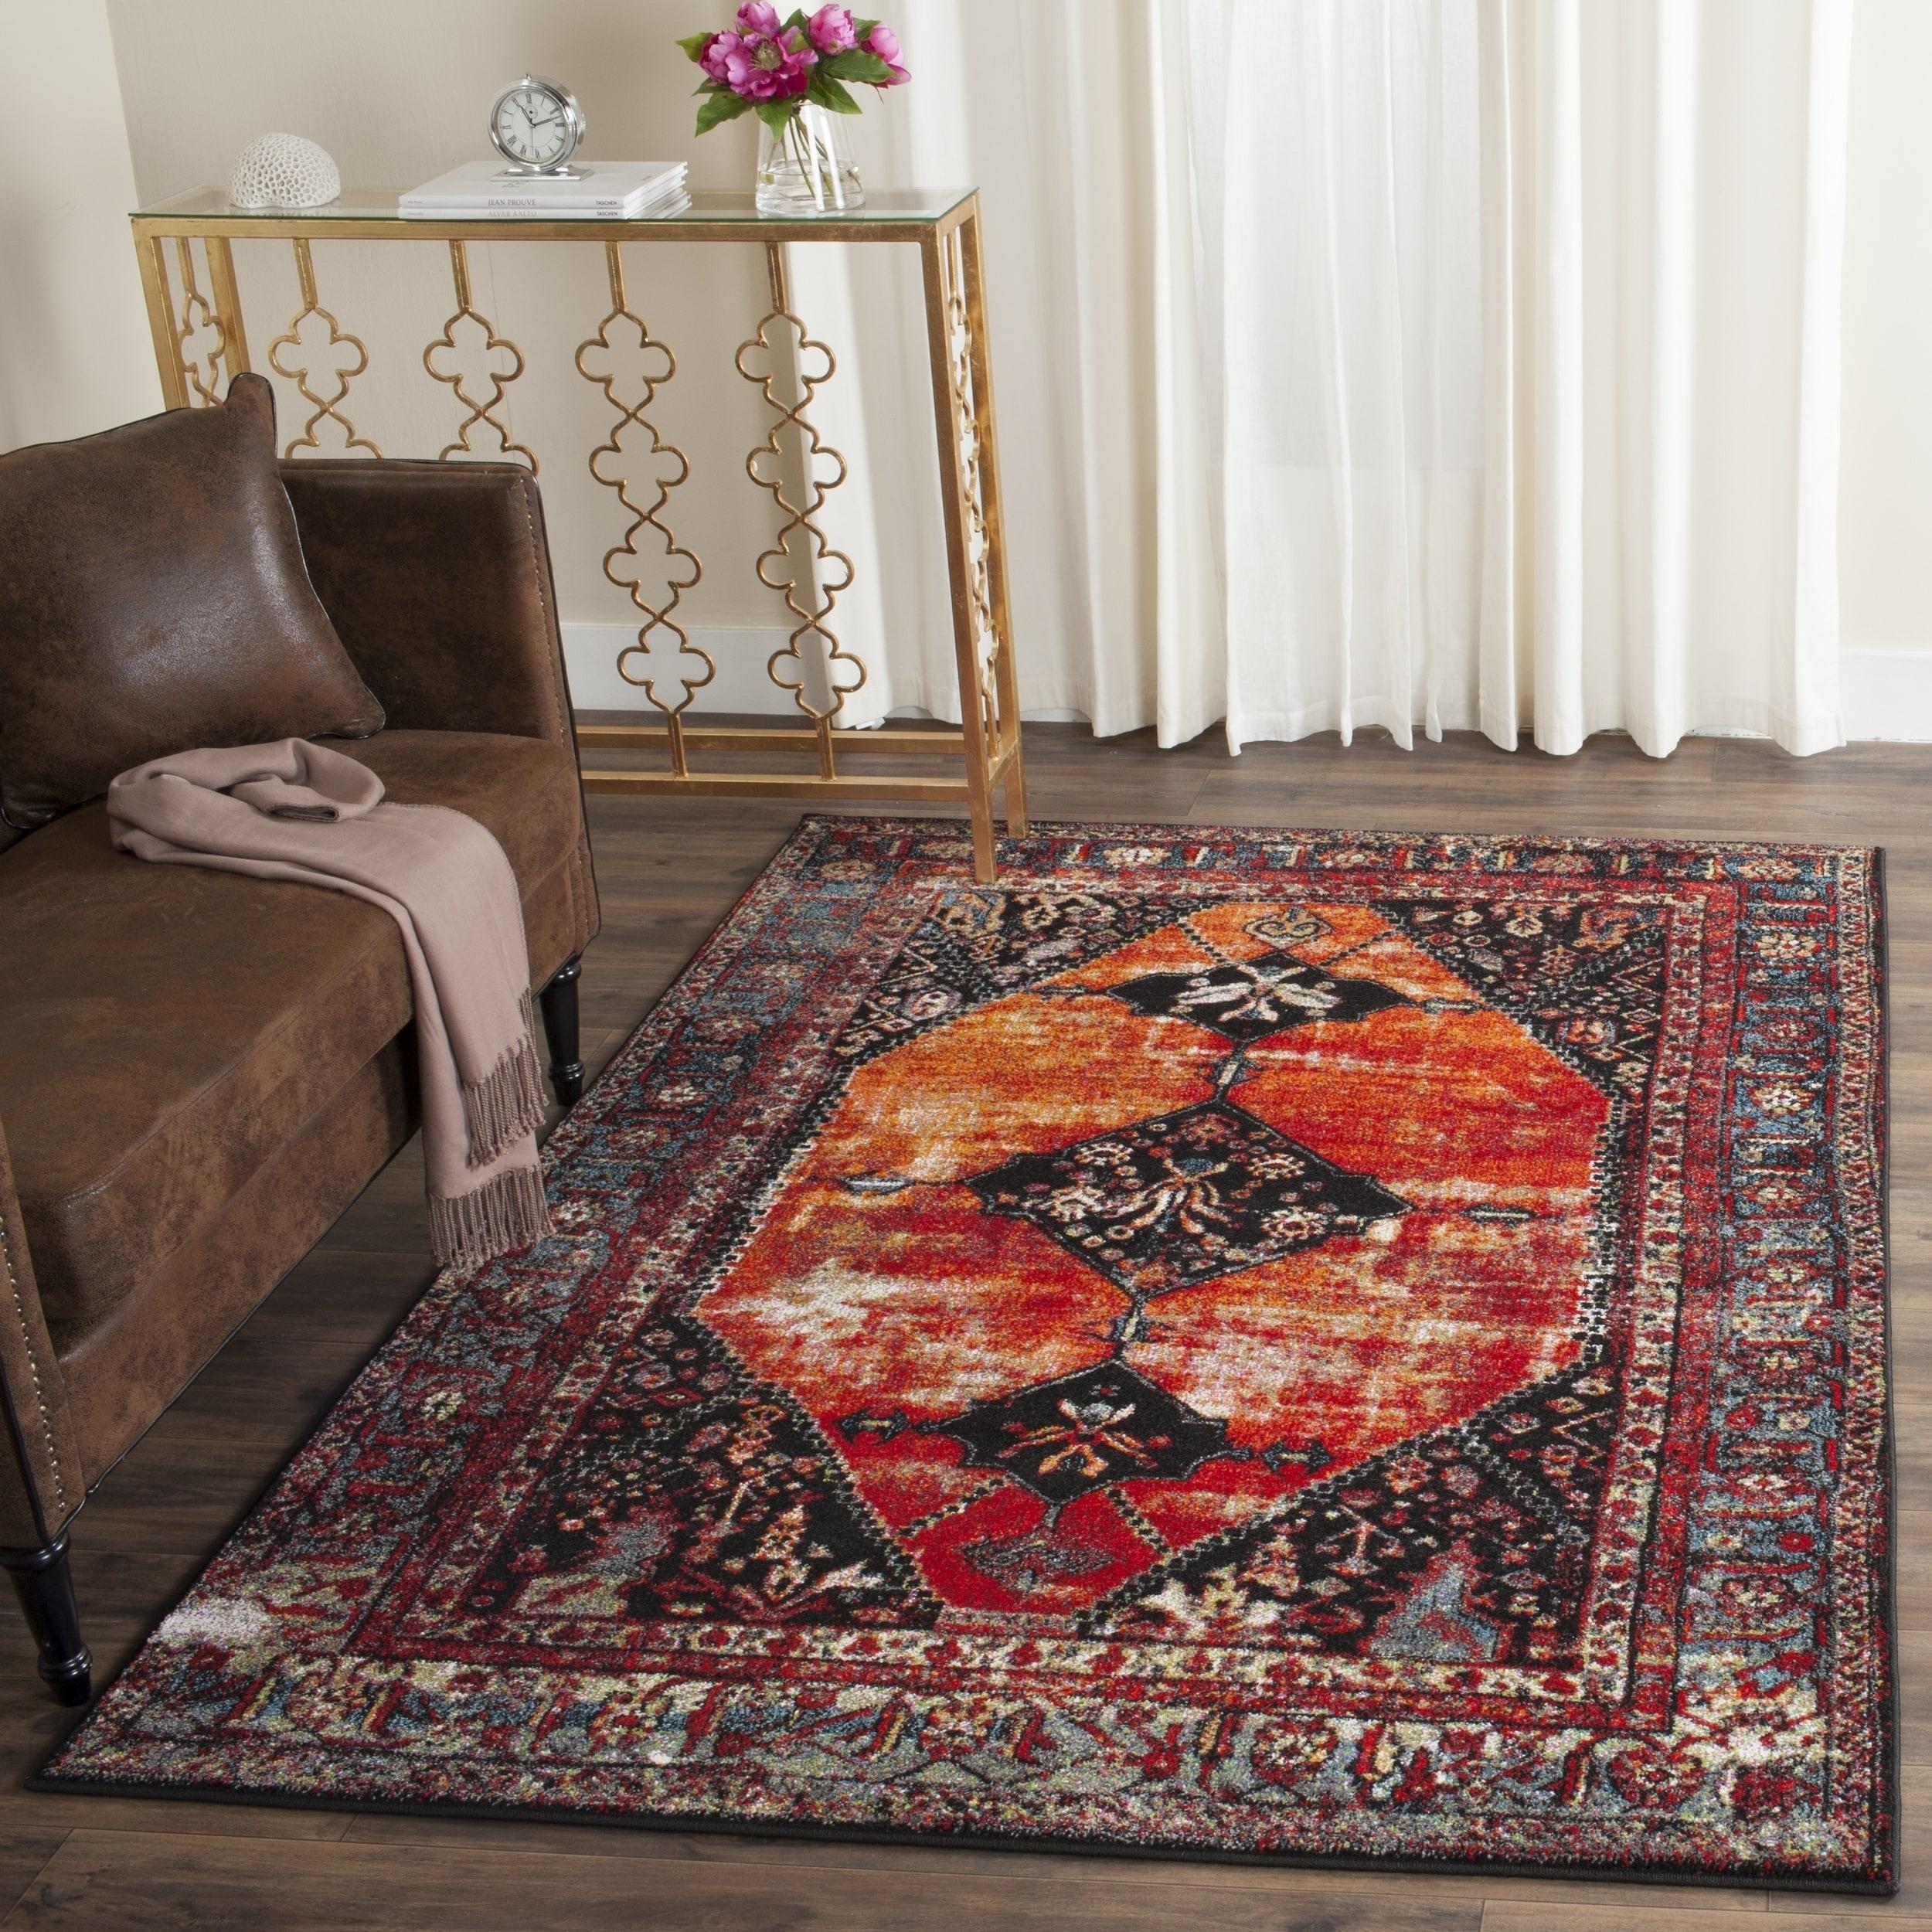 vintage rugs best persian-inspired on sale orange multi-color safavieh